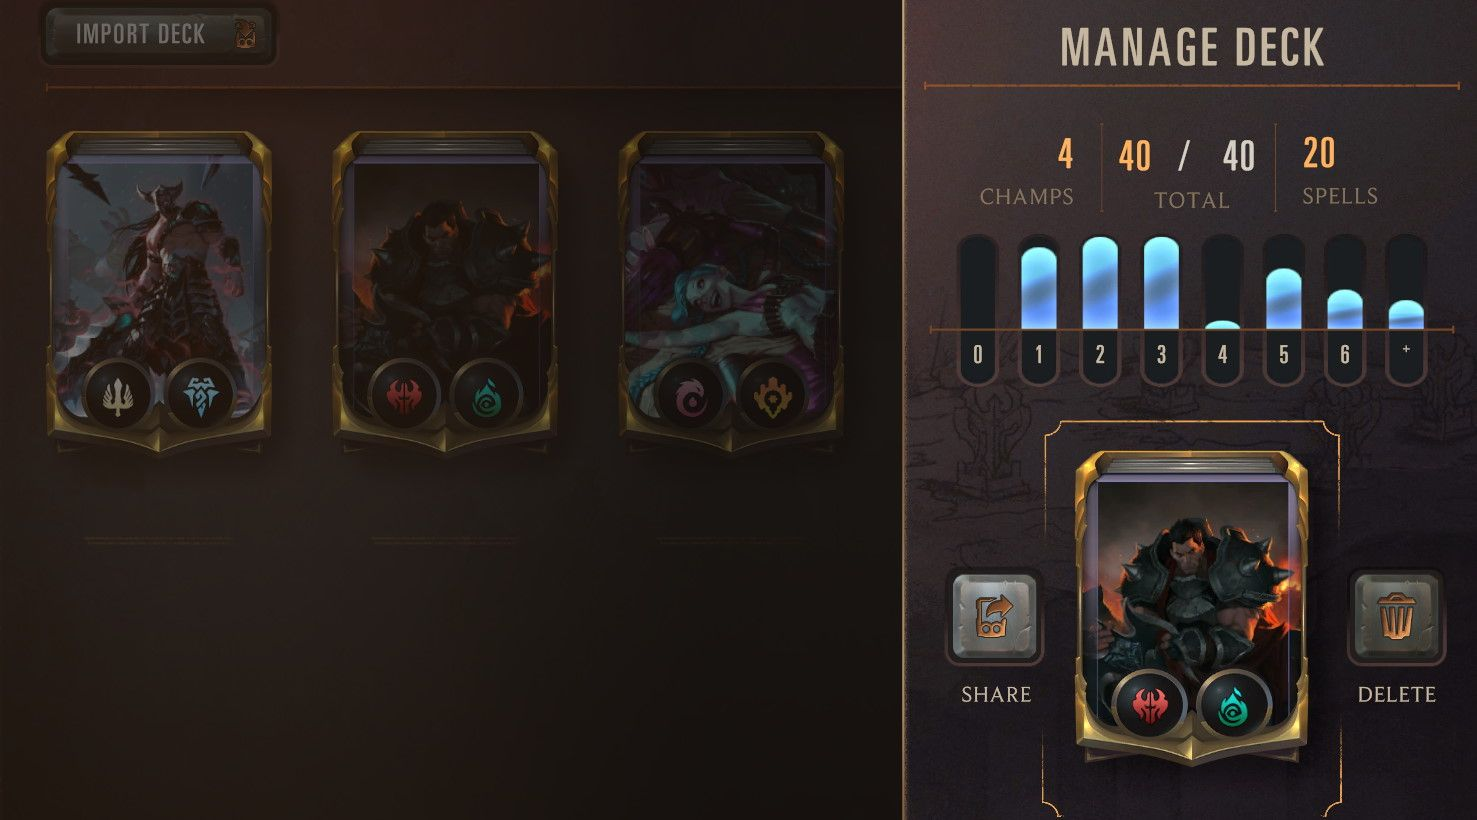 Share (export) a deck in Legends of Runeterra